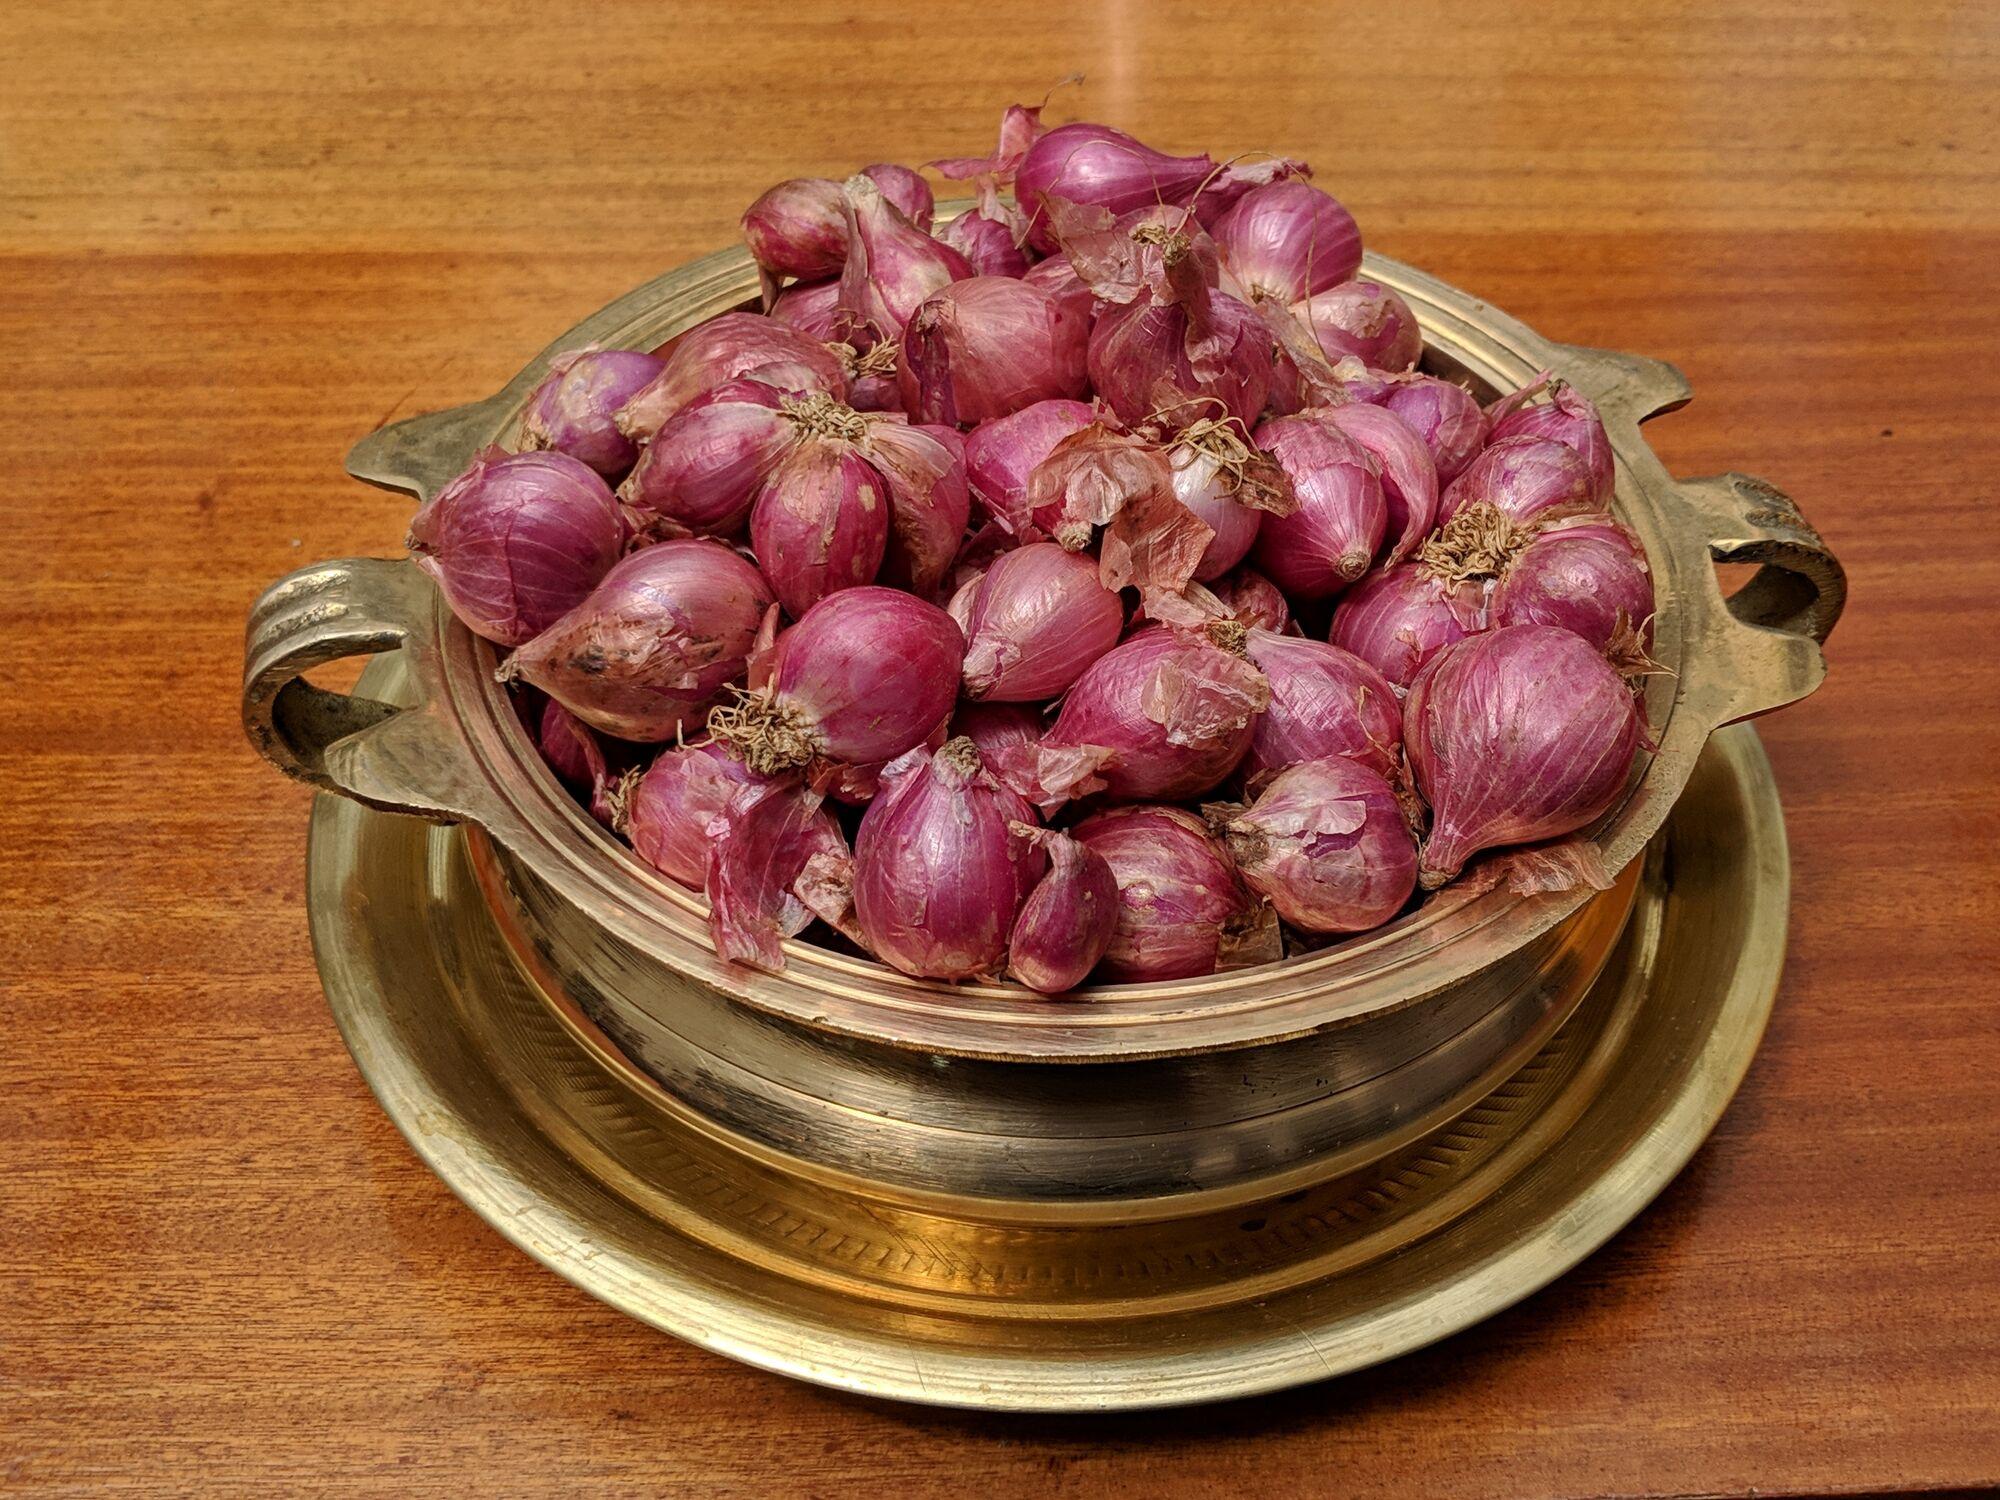 Onions in bronze utensil